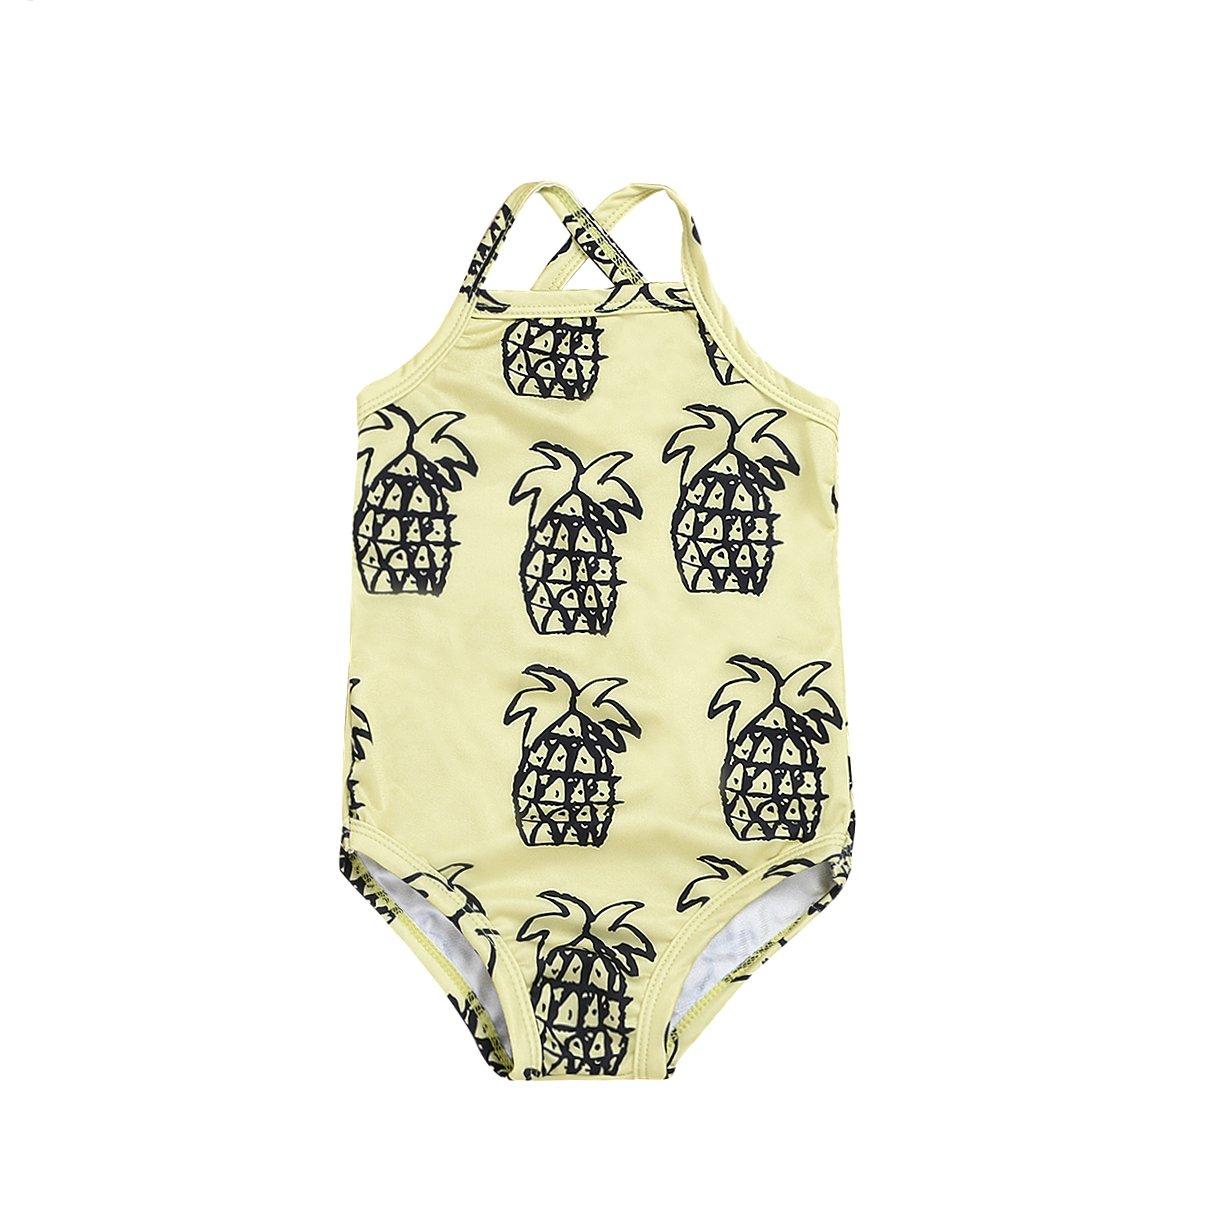 e49dfa600e7d Top 10 wholesale Pineapple Tree - Chinabrands.com